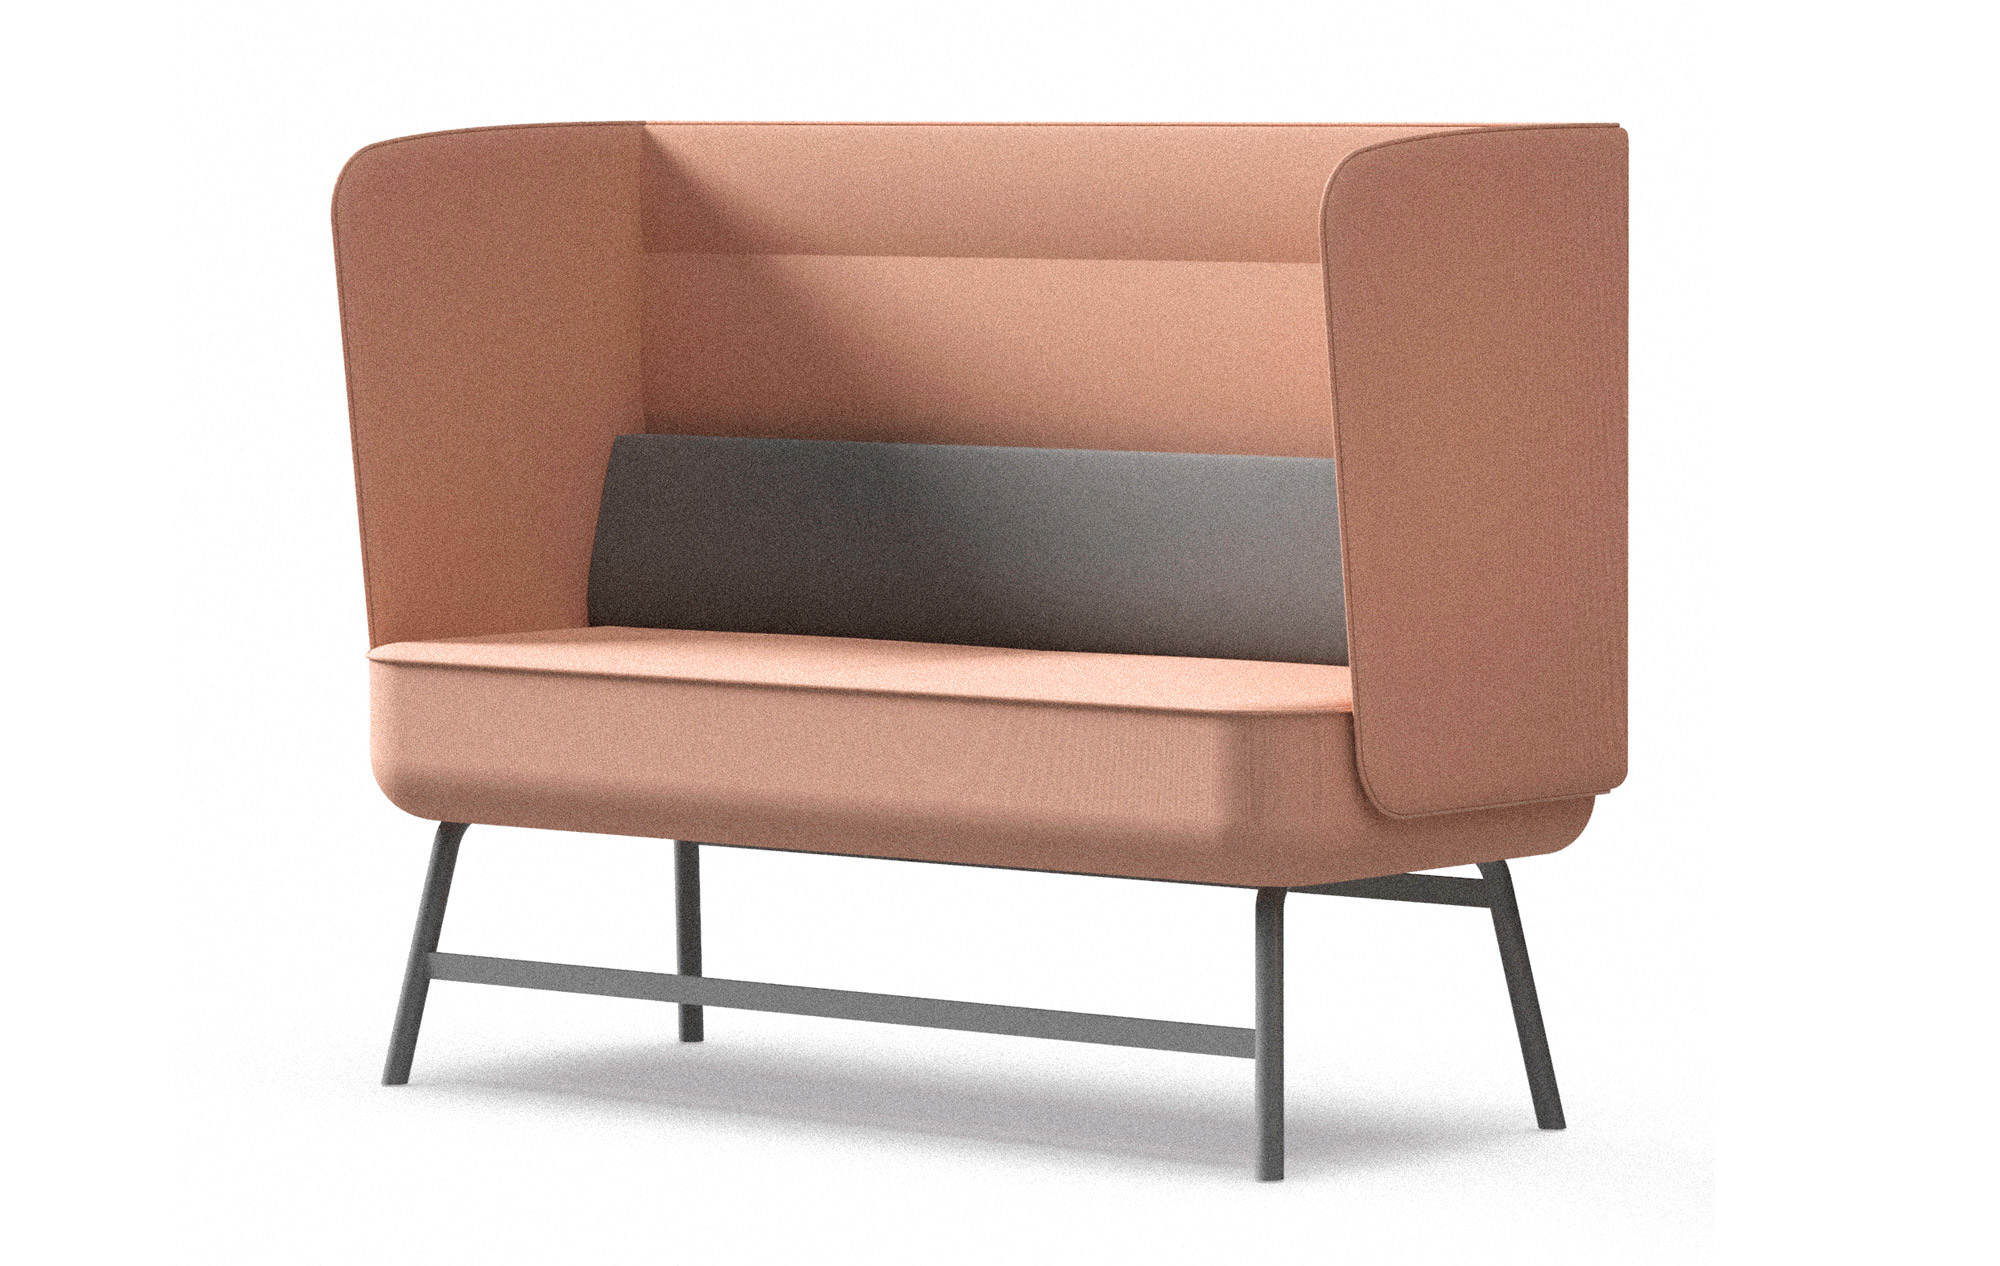 Big-Boi-sofa-2000